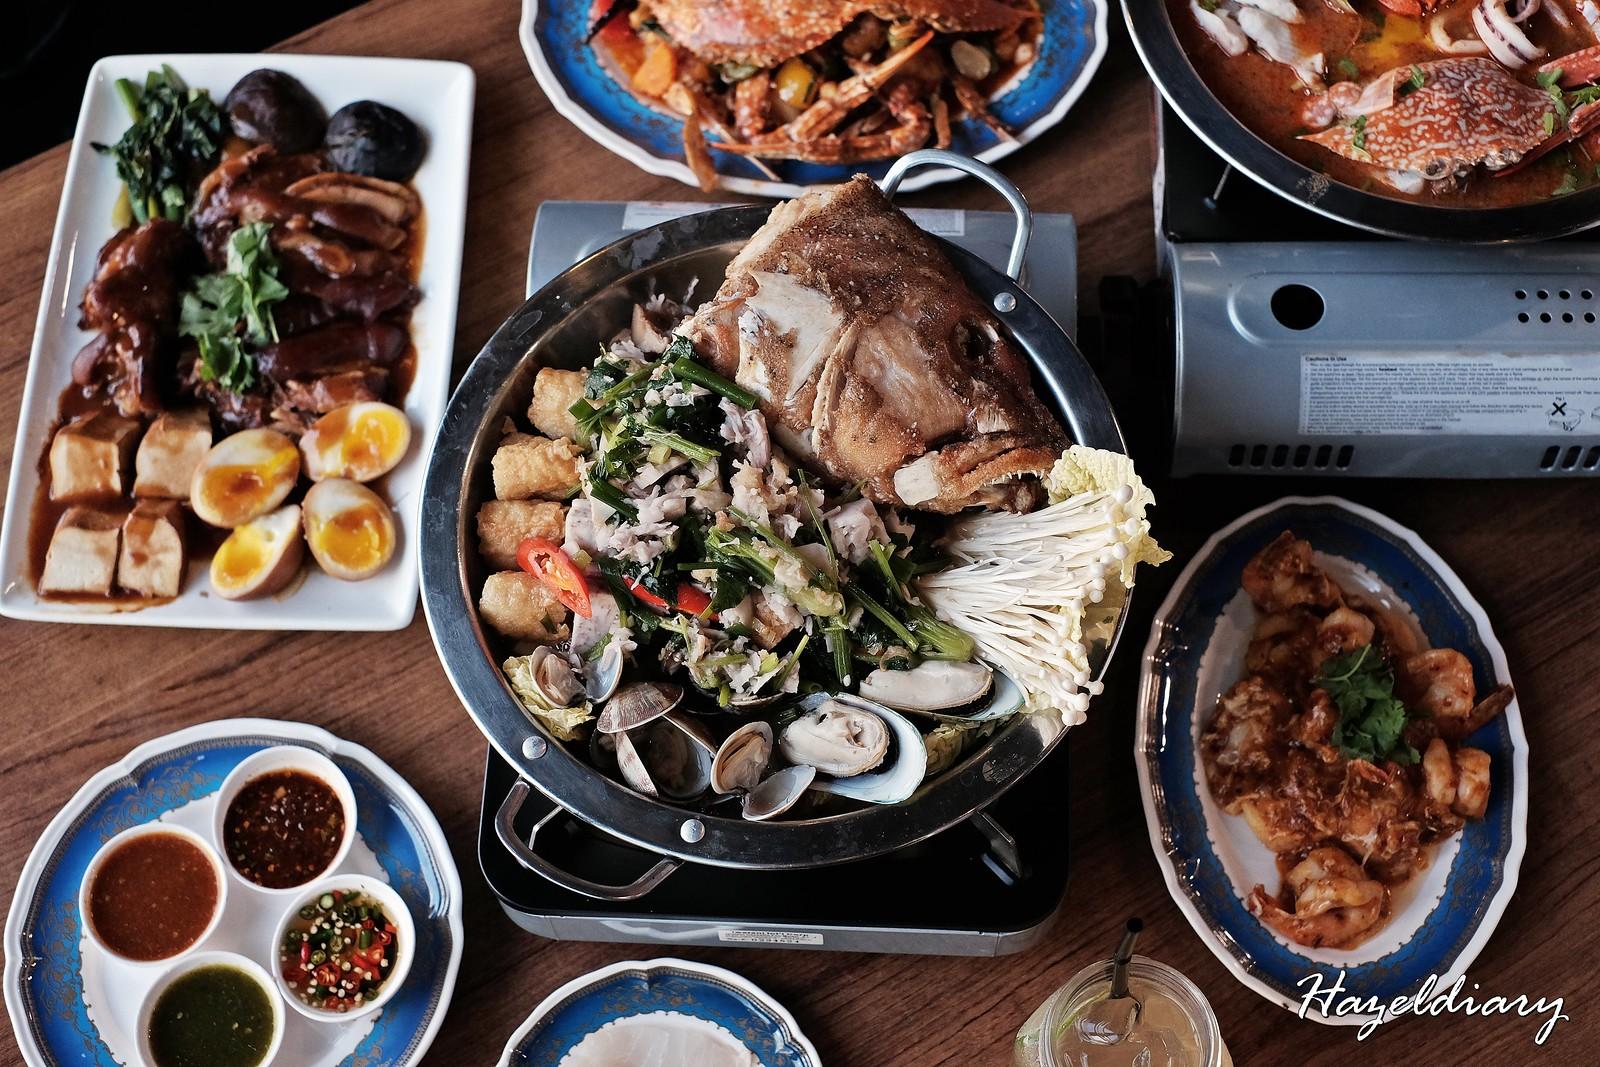 Soi Thai Soi Nice-Seafood Porridge hotpot